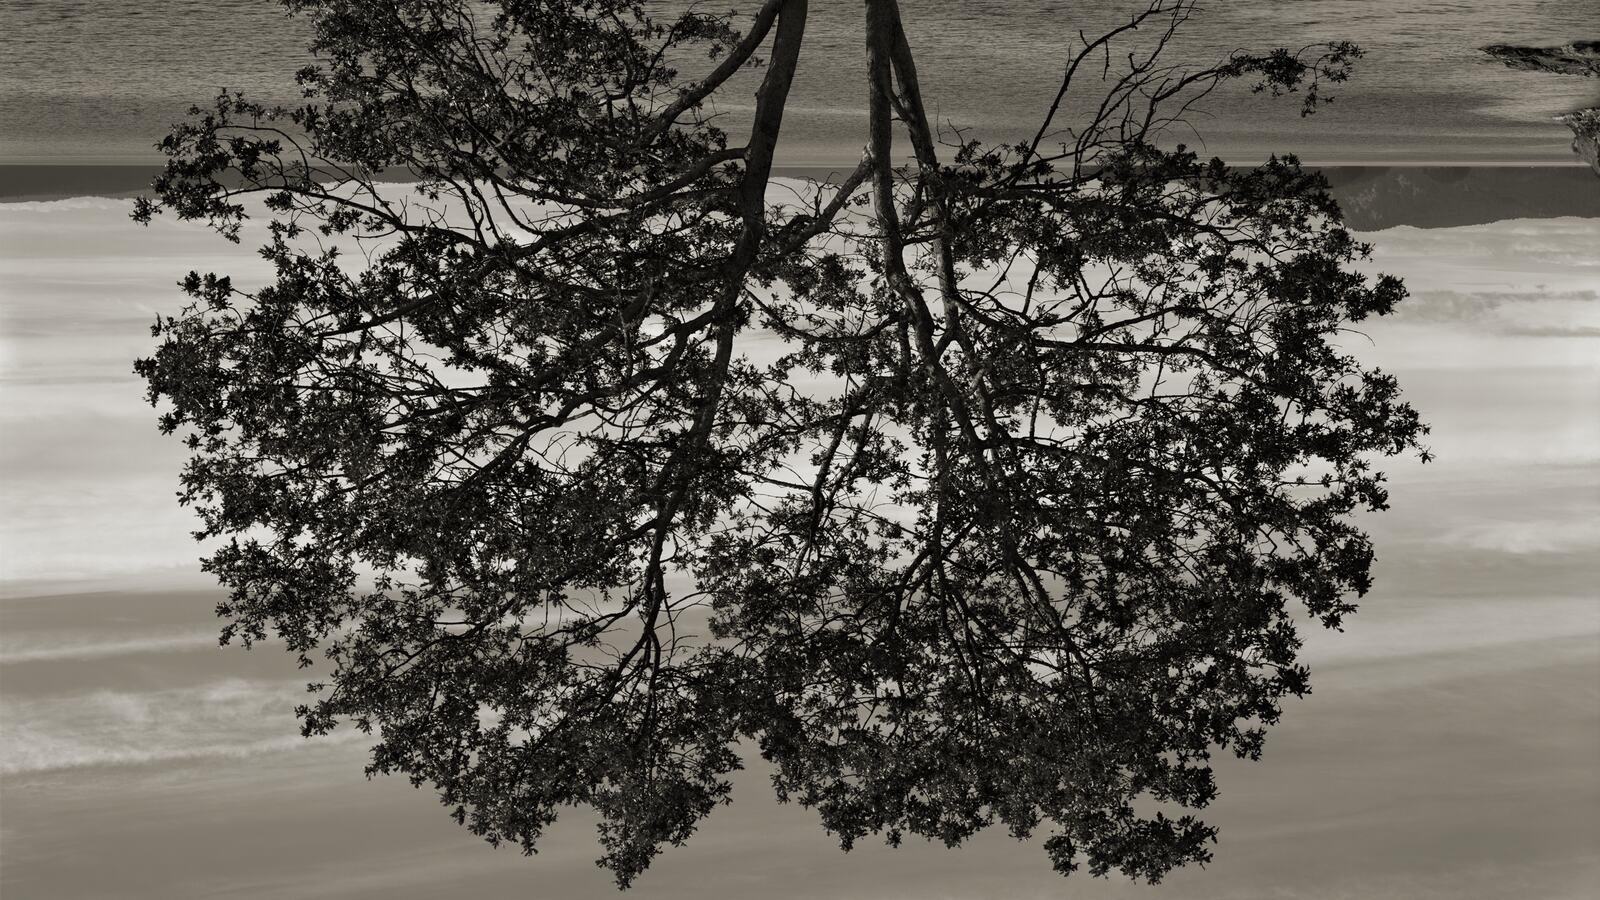 Rodney Graham, Gary Oak, Galiano Island, 2012. © the artist 2020. Courtesy Hauser & Wirth.